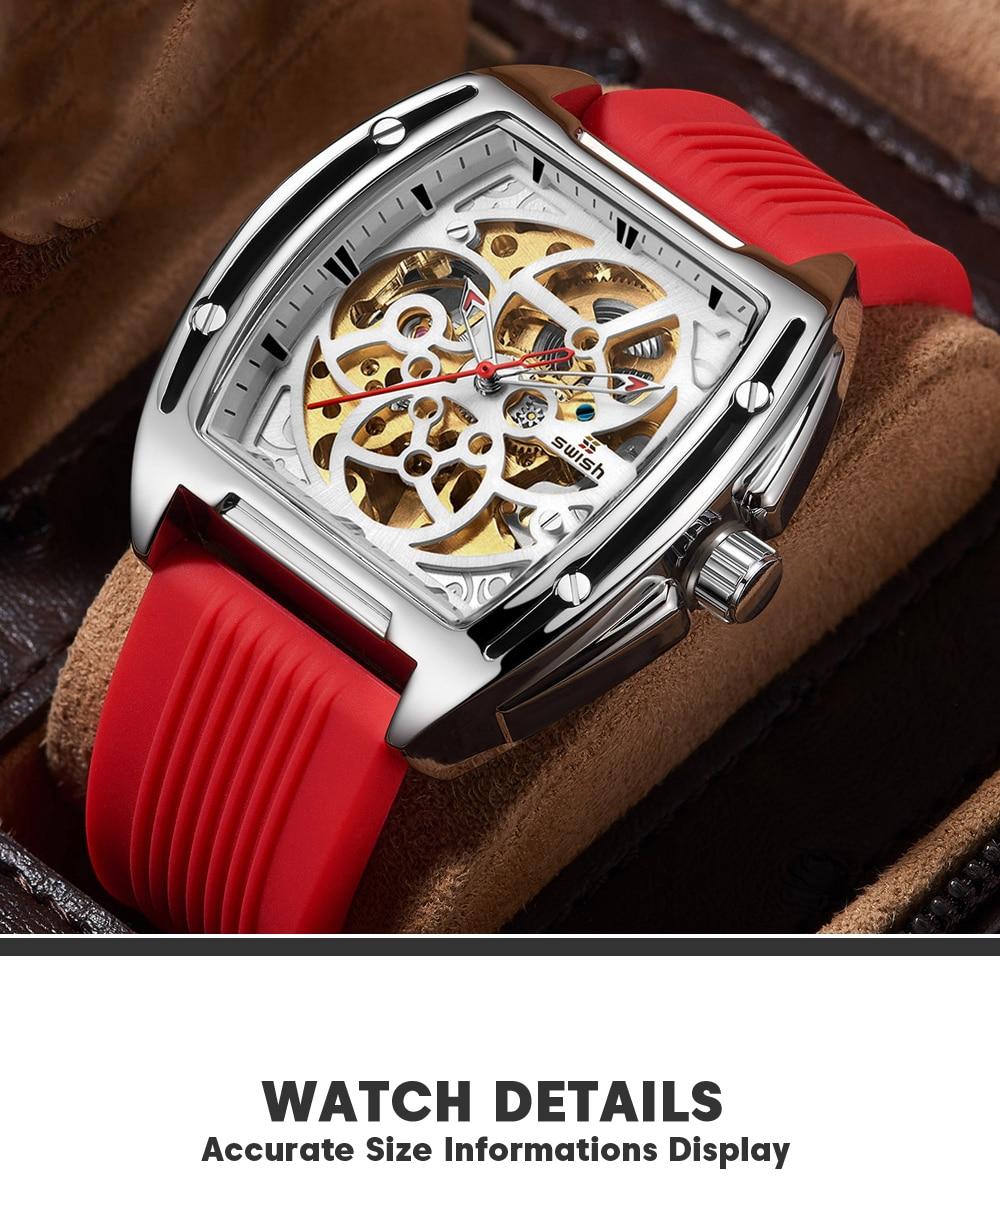 H83339dc7f8634a16a4b38b65de2a784eq SWISH Brand Design Luxury Men's Mechanical Wristwatch